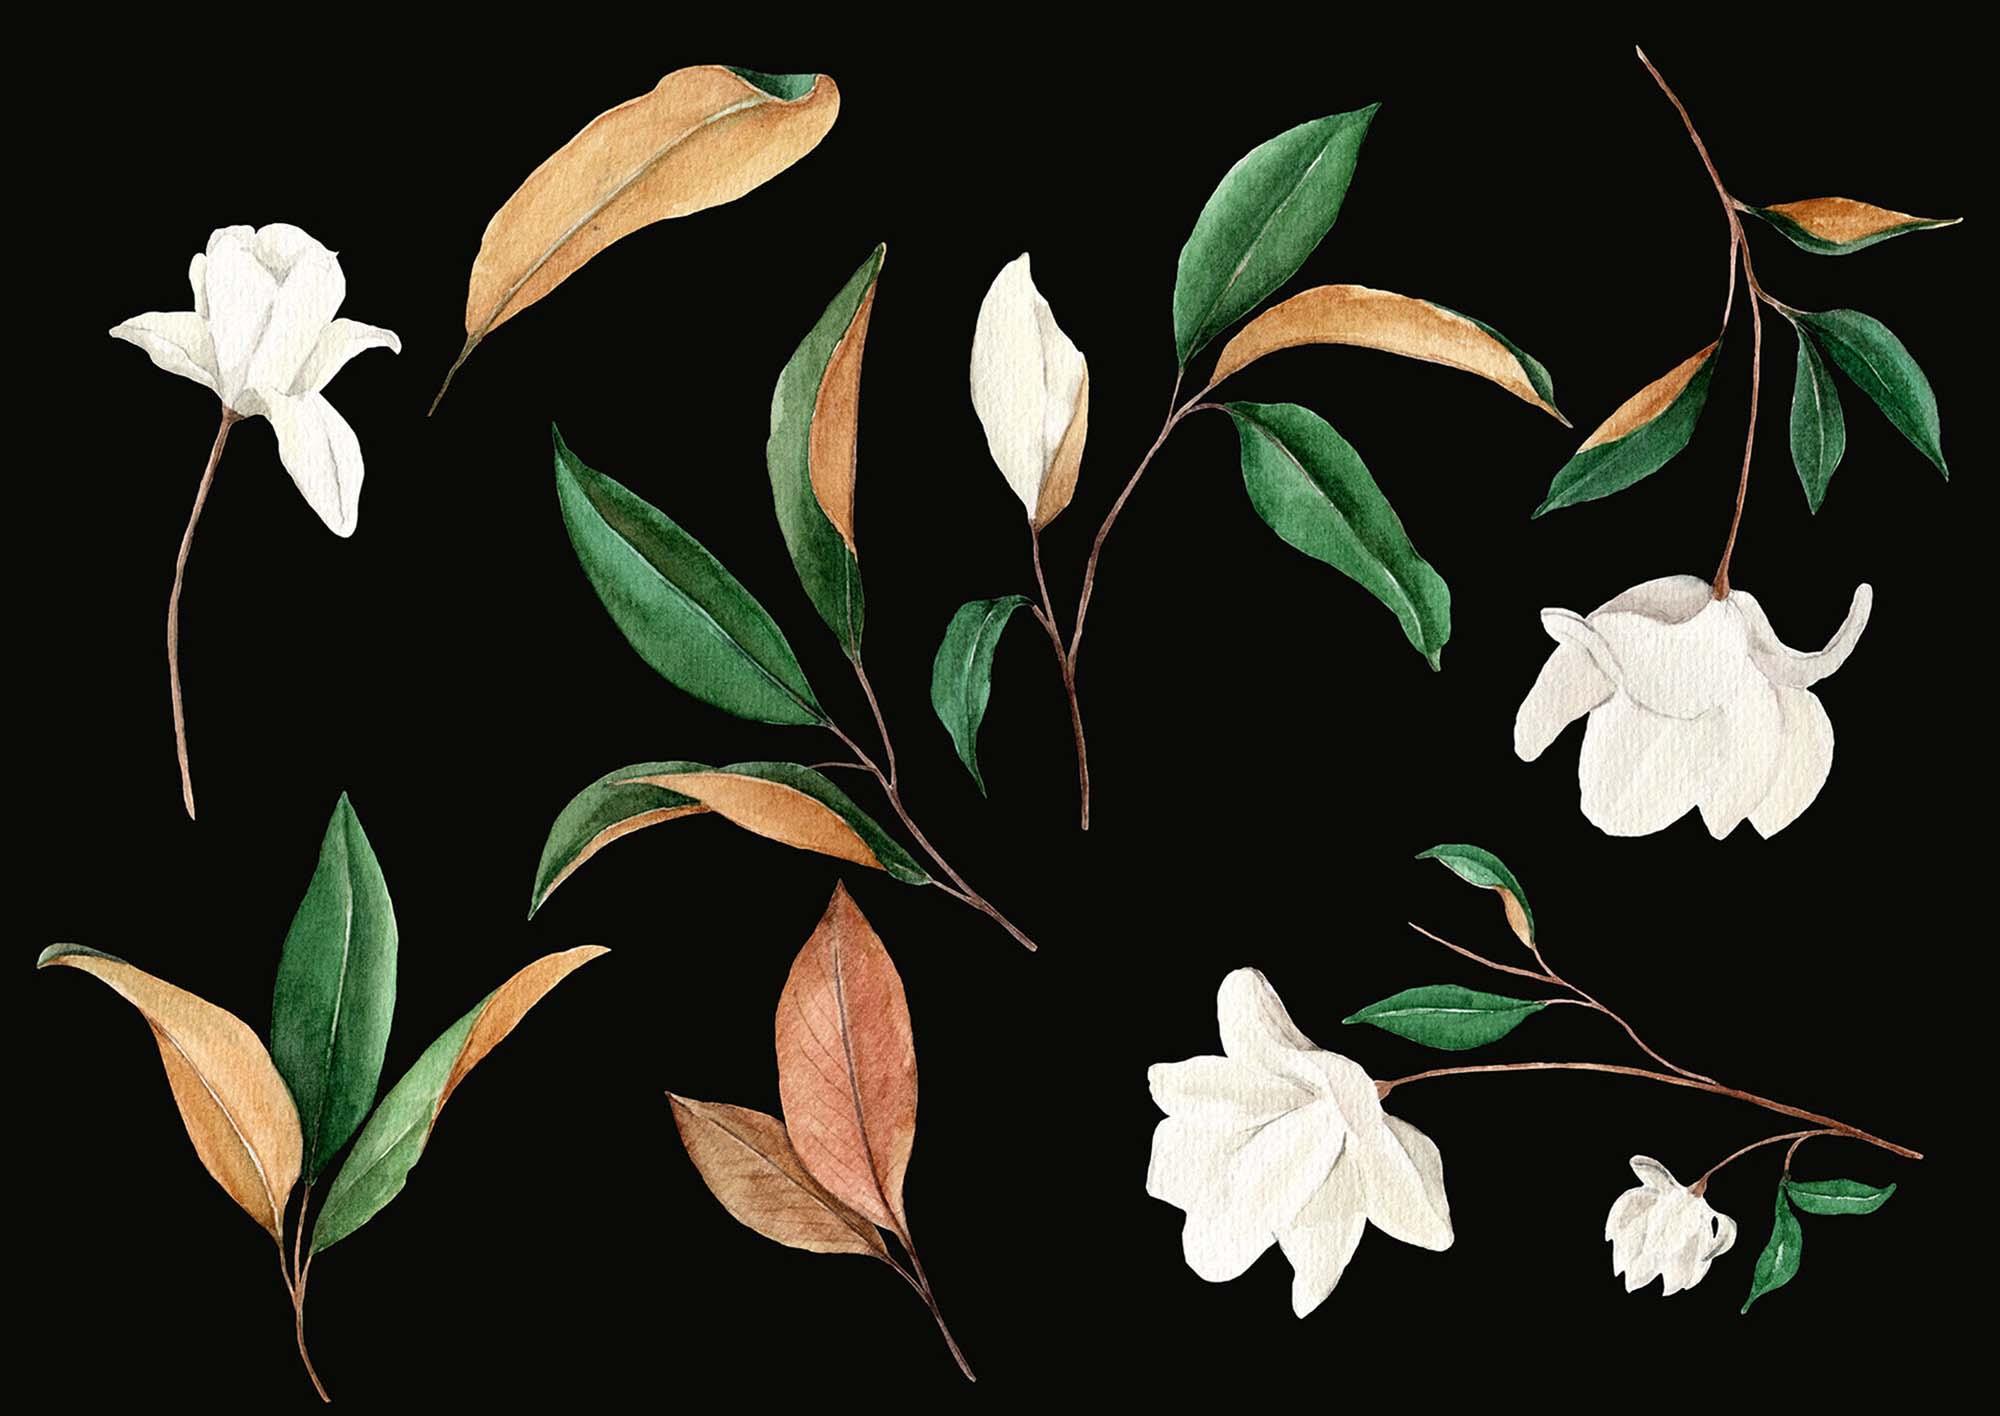 Magnolia Floral Graphic Design Elements